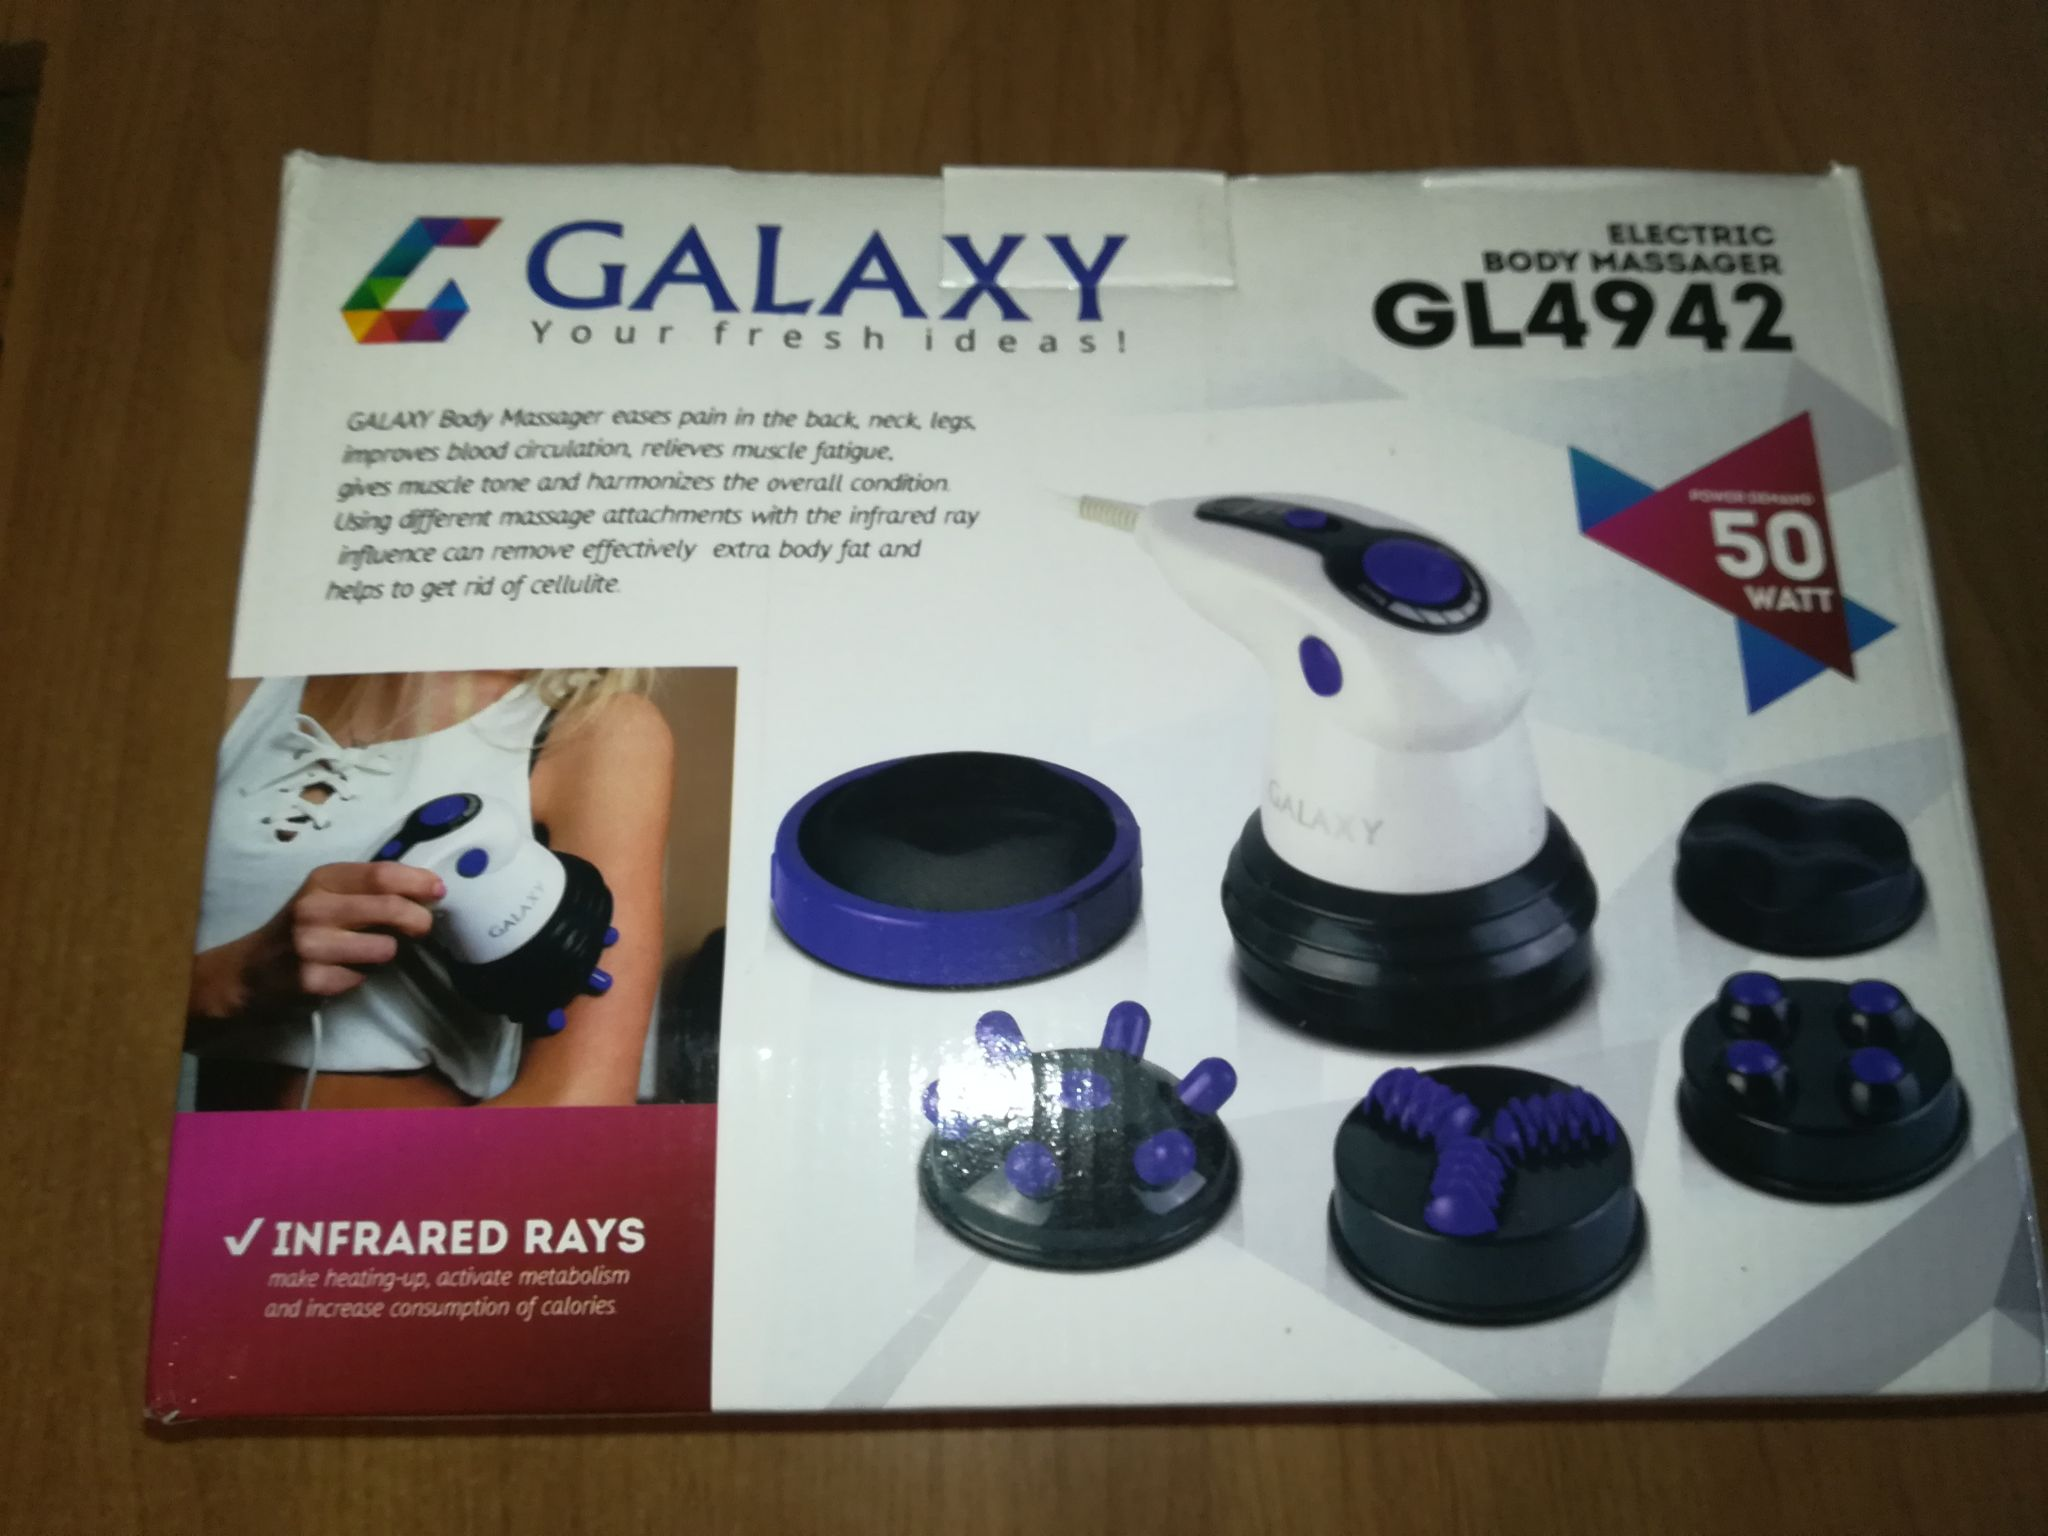 Массажер ручной galaxy gl4942 массажер офисный